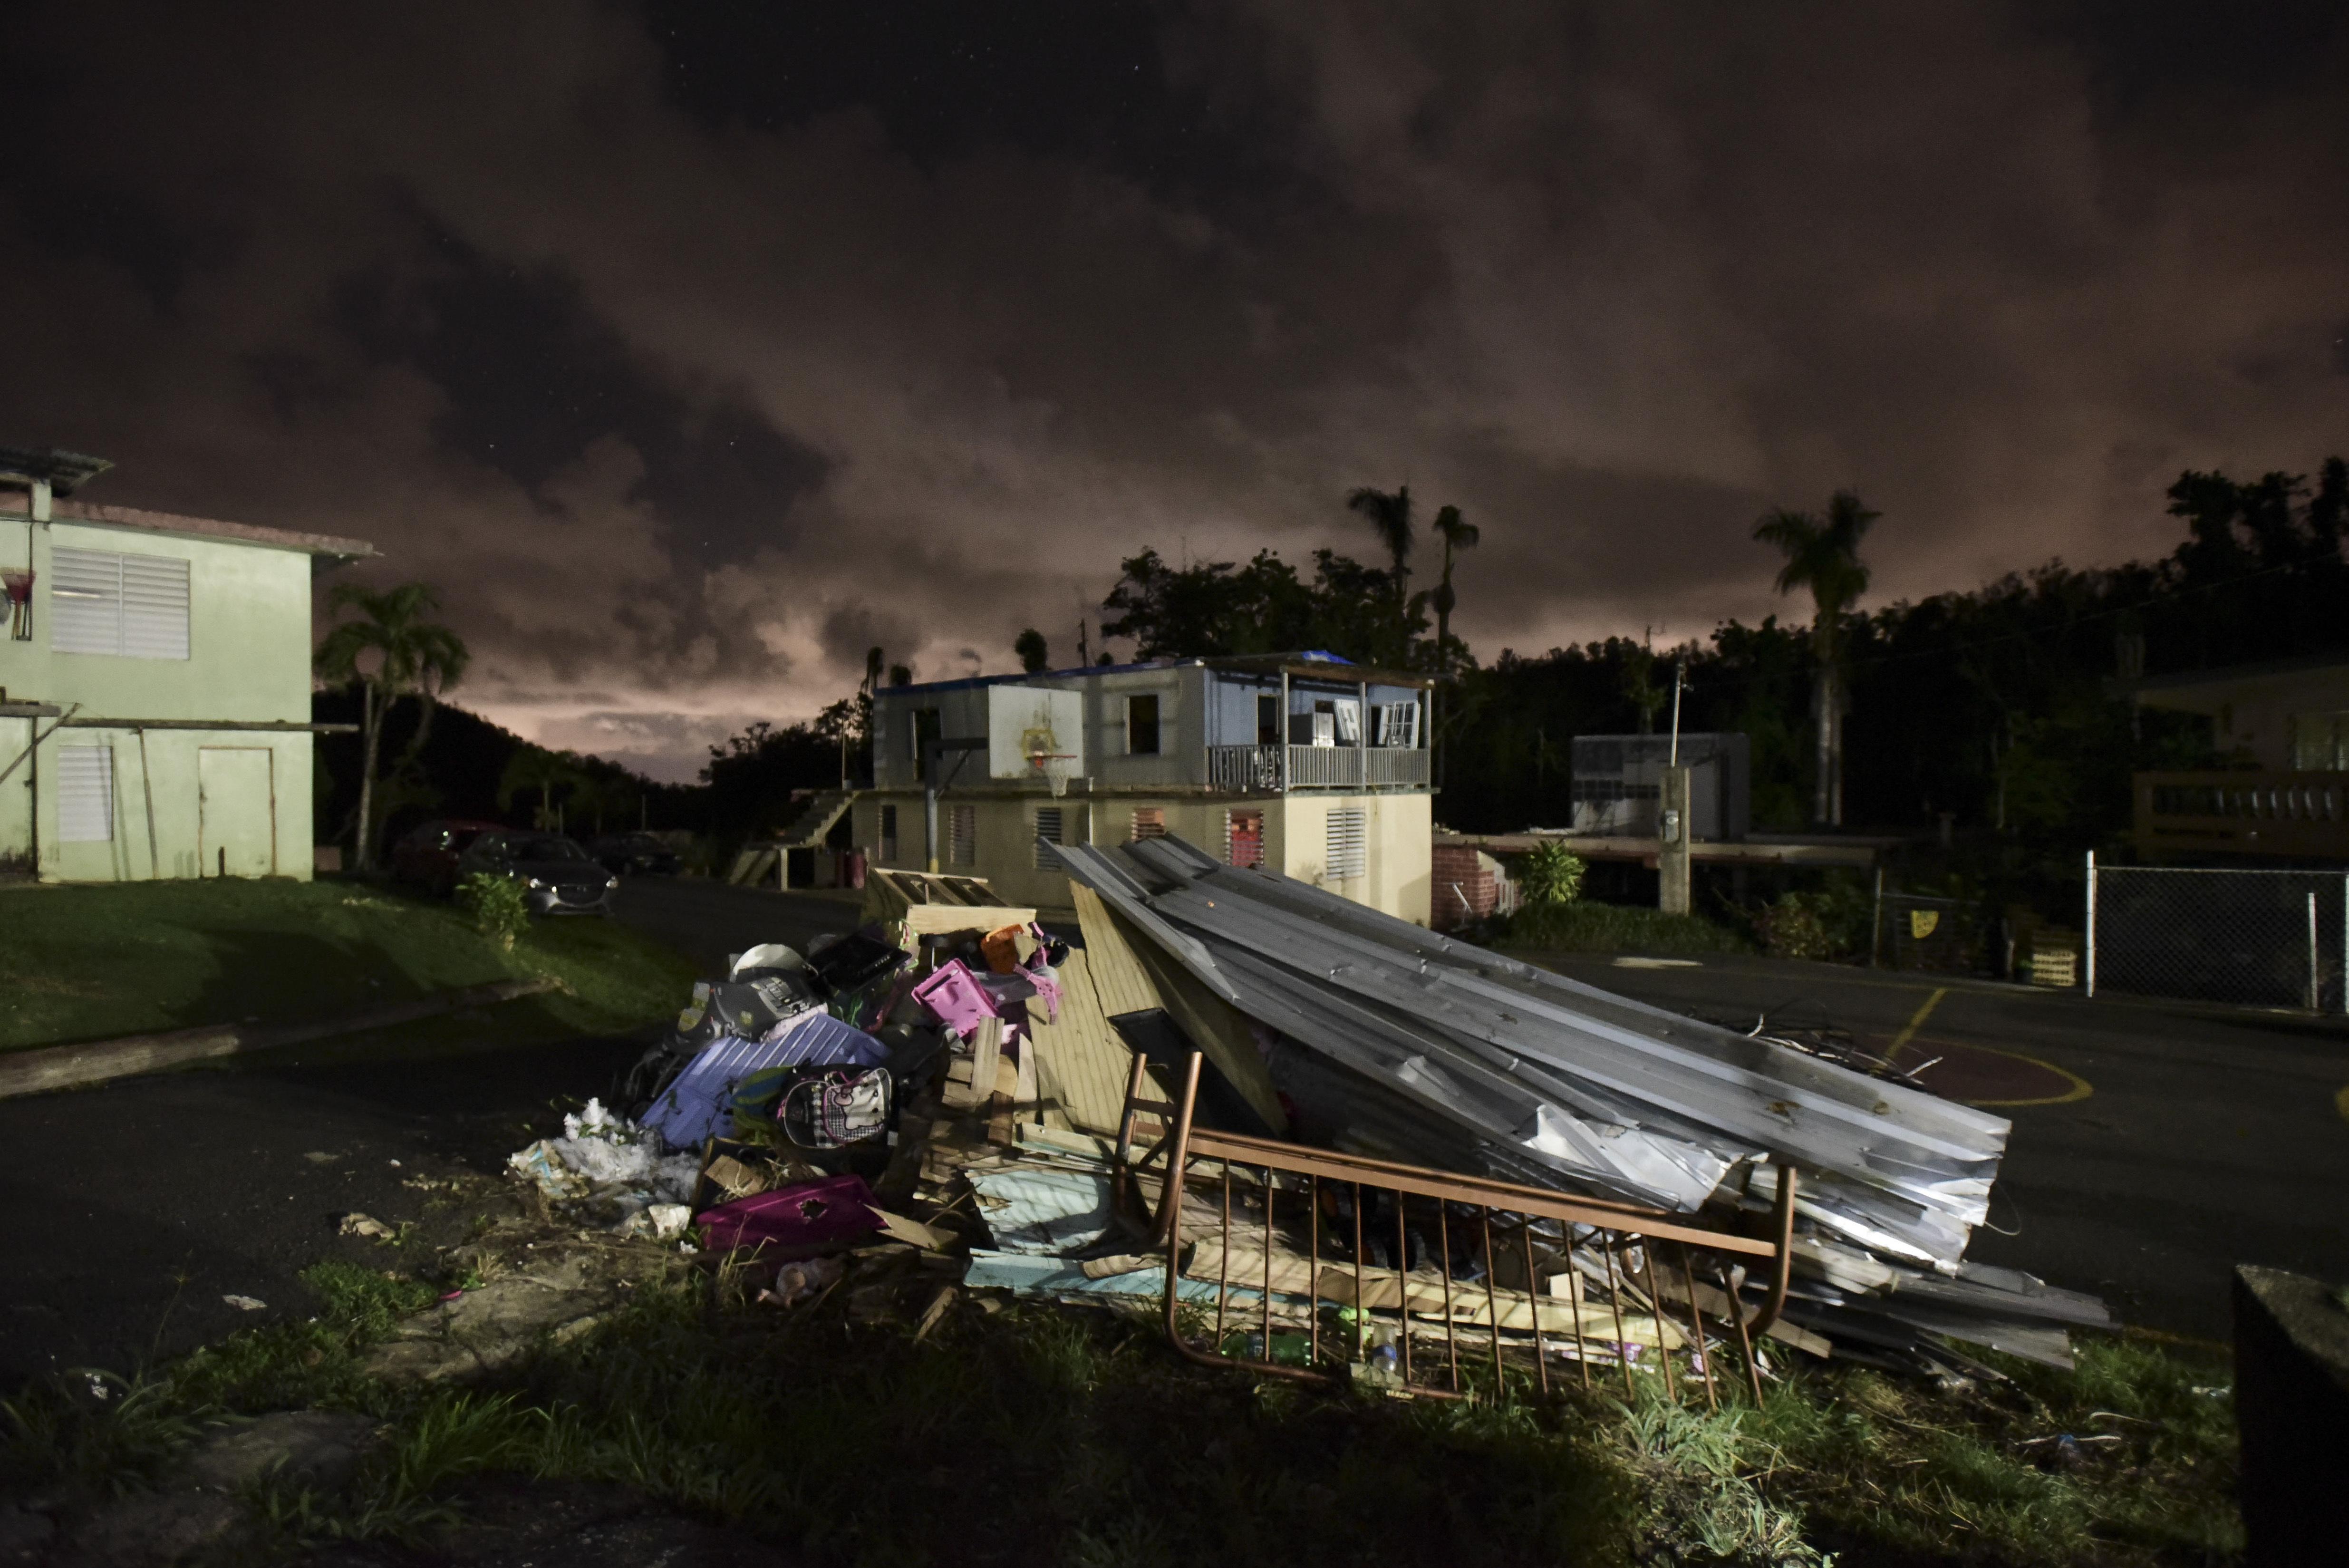 Hurricane Maria's devastation follows Puerto Ricans into the New Year